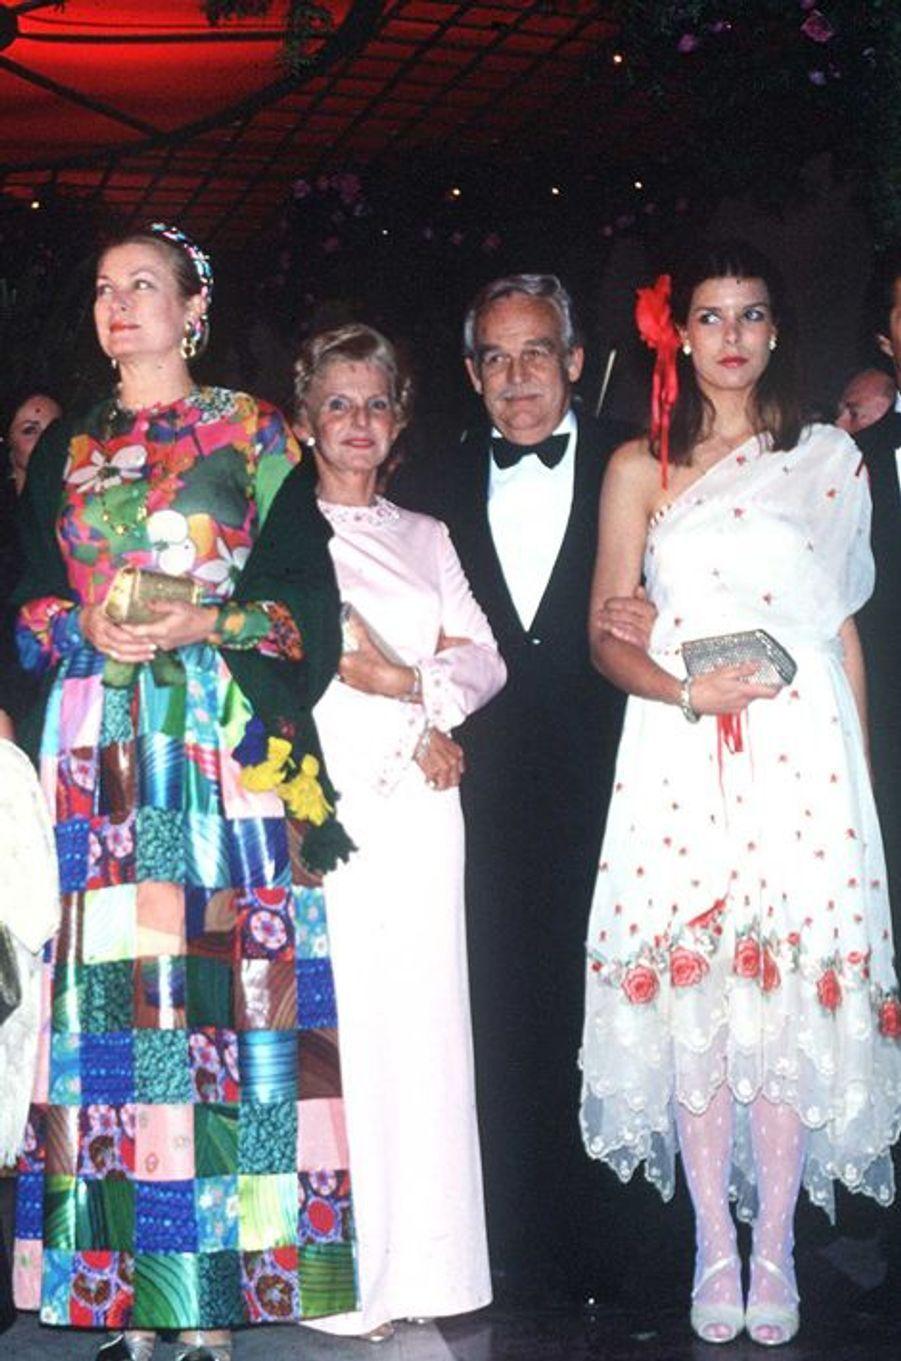 La princesse Caroline de Monaco au bal de la Rose 1979, avec le prince Rainier III et la princesse Grace